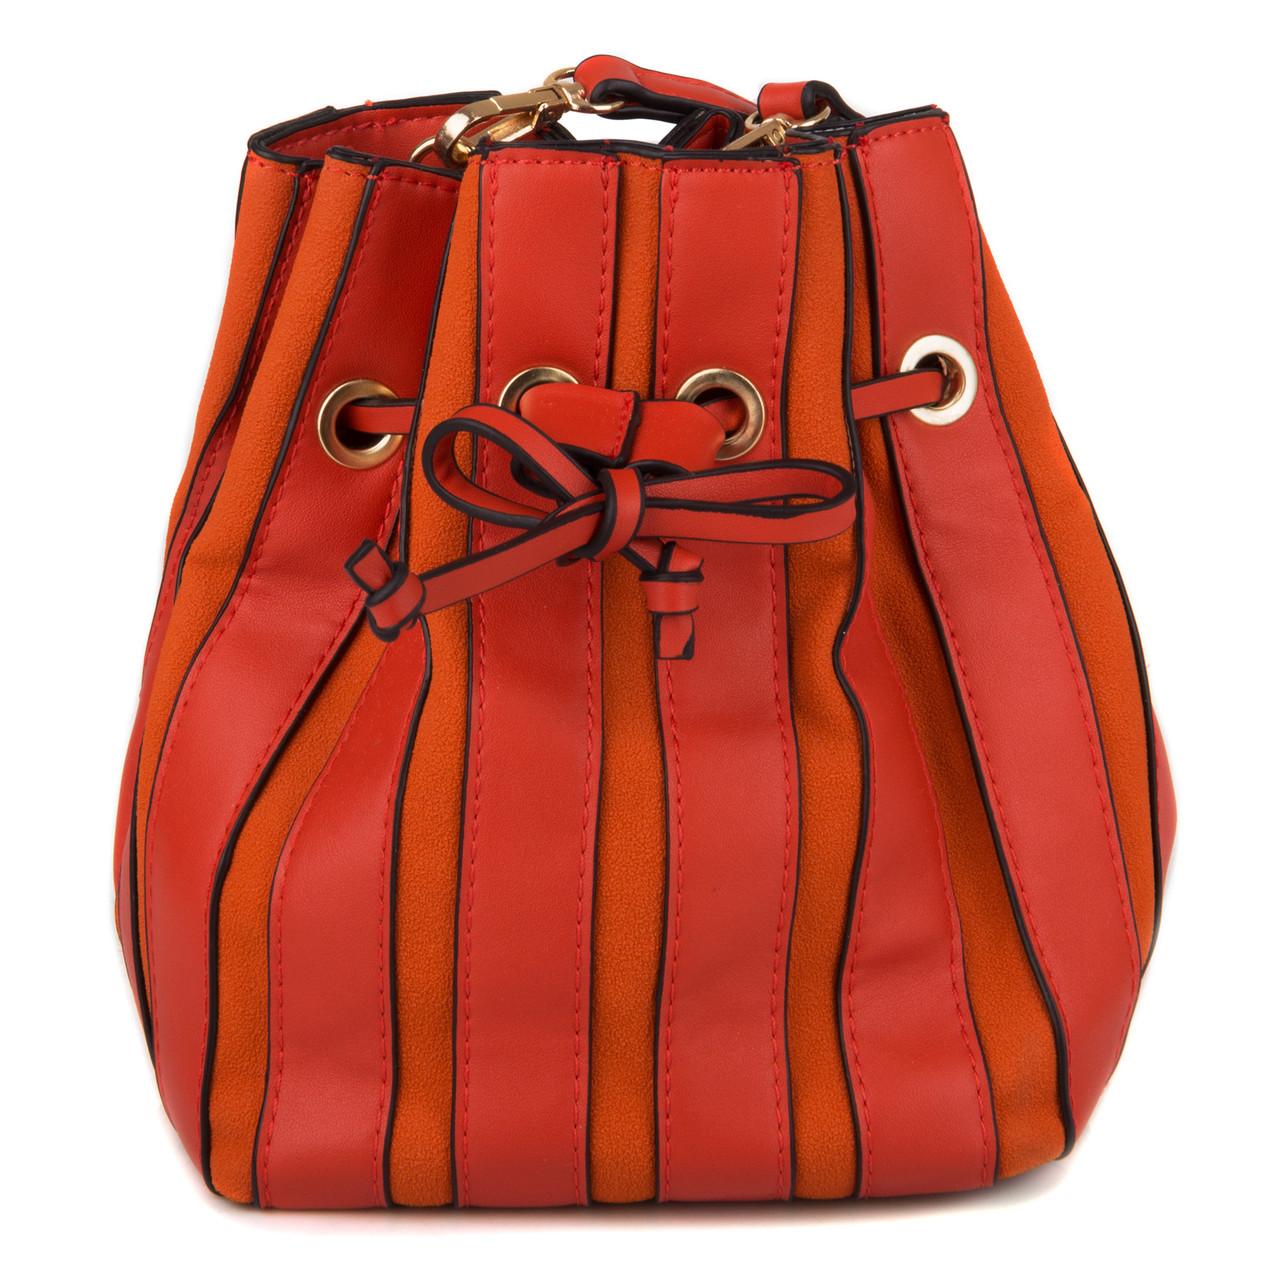 3070b47cfc22 Женская Сумка - Мешок на кулиске Kafa 001 оранжевая: продажа, цена в ...